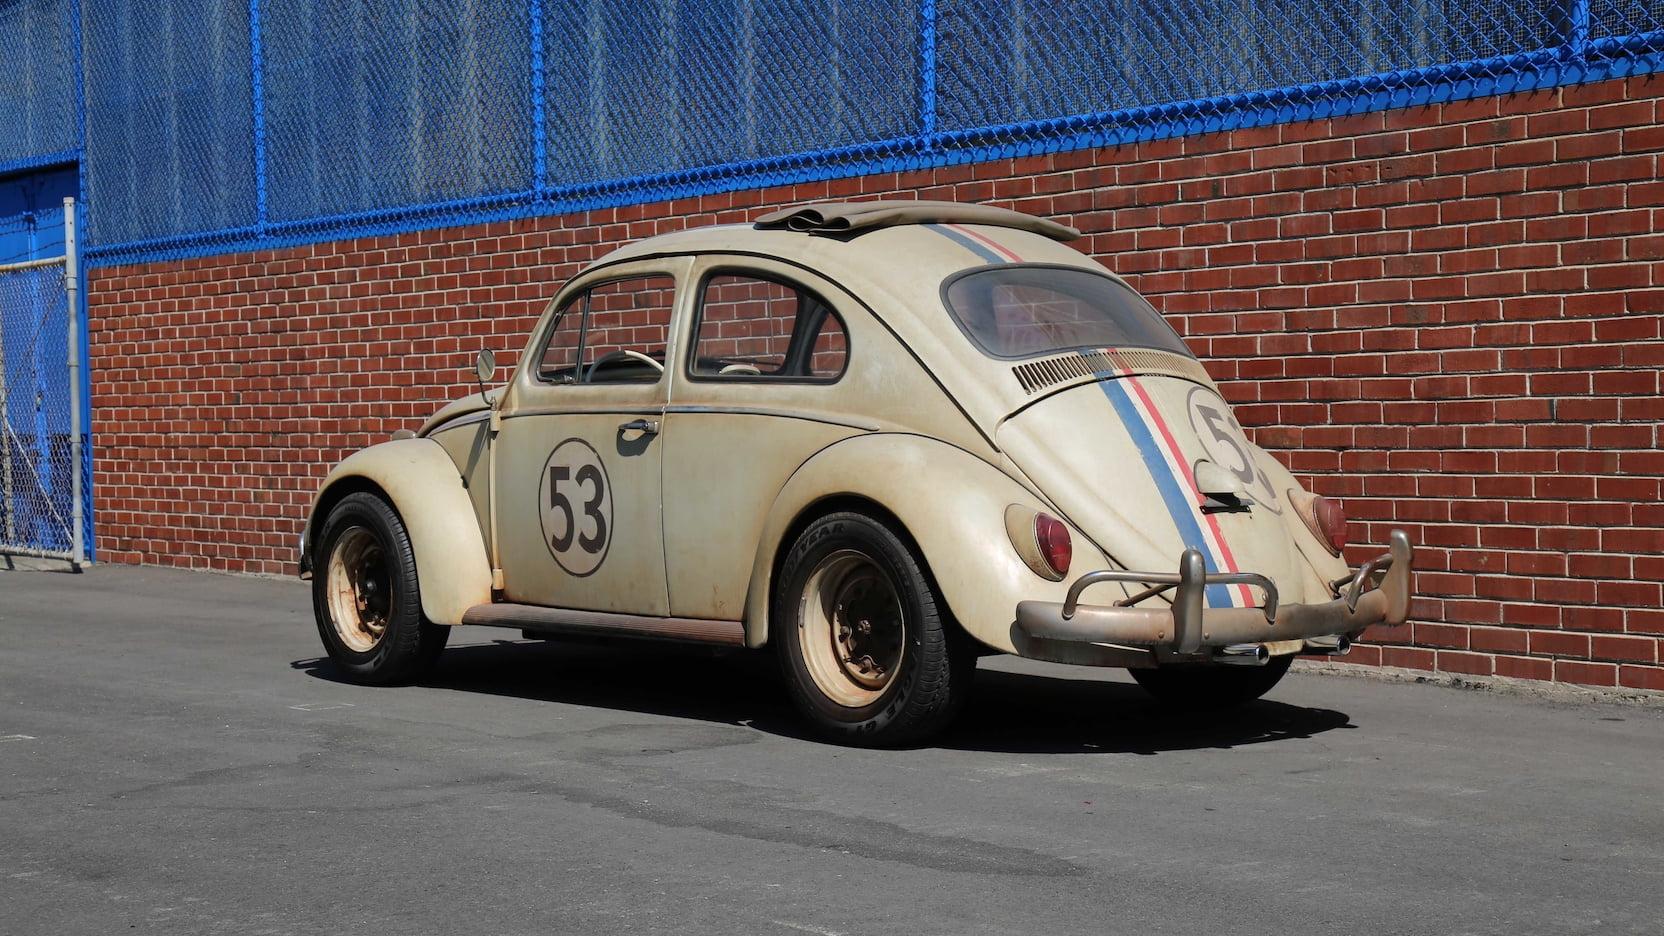 Junkyard Herbie from Herbie: Fully Loaded